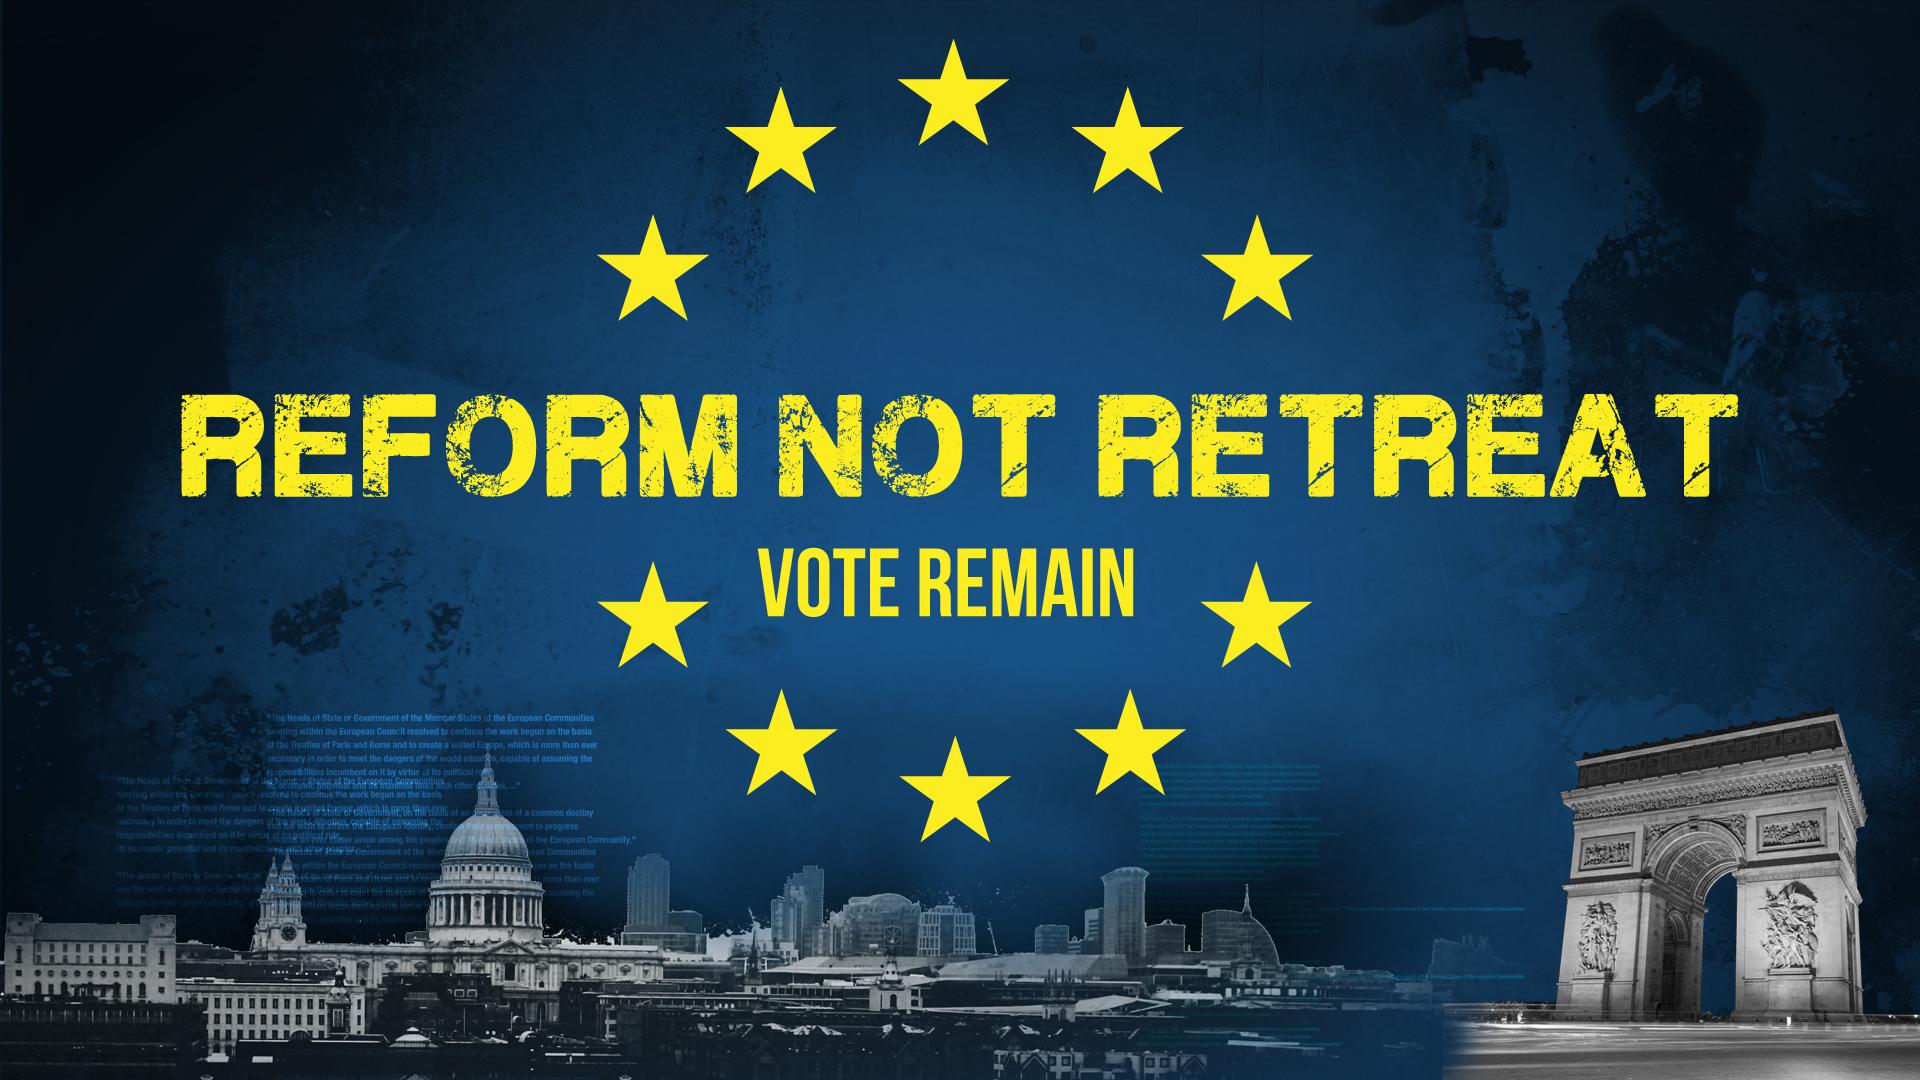 JSC EU Reform not retreat